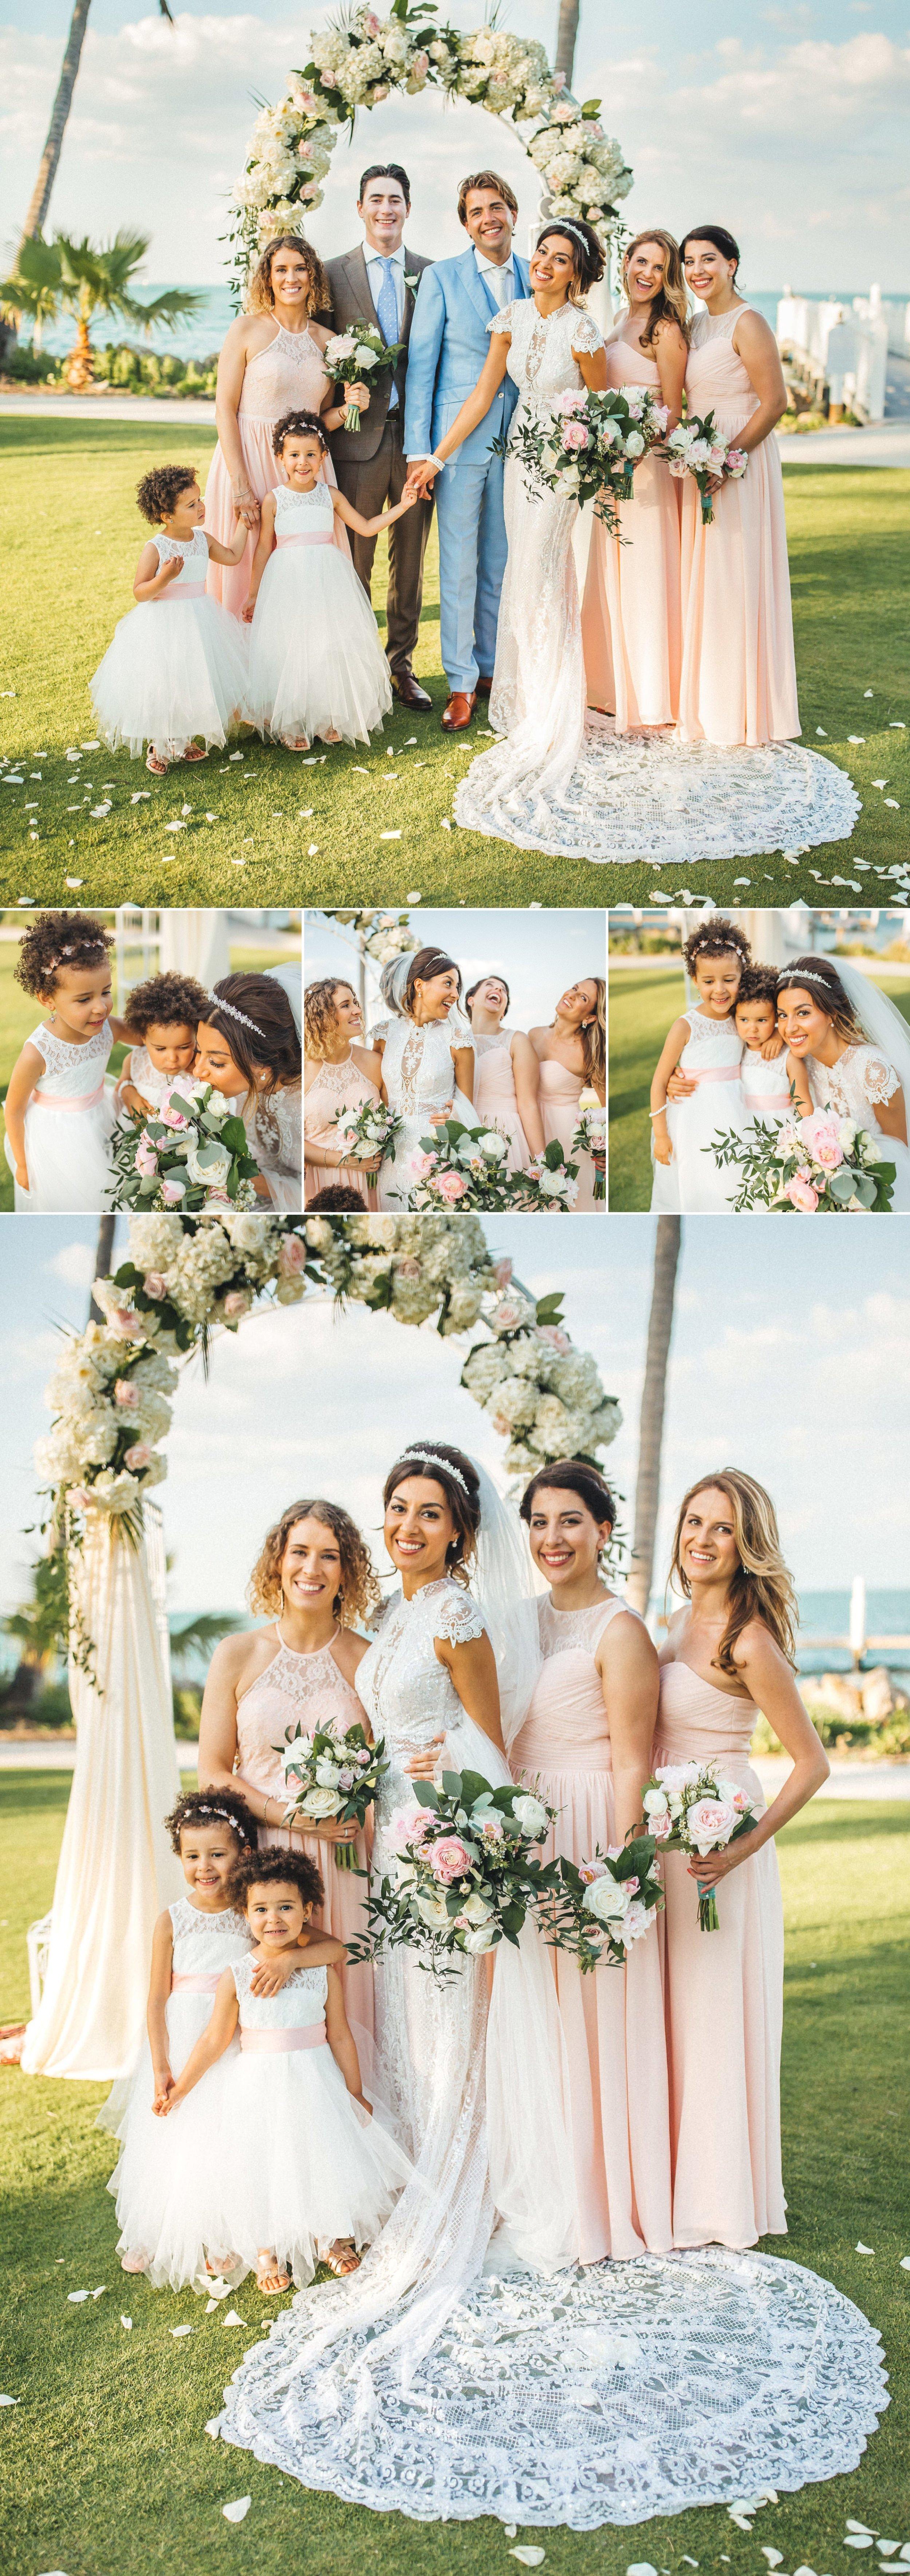 Captiva Island Destination Elopement Wedding Photography-blog- Zohra+David-by-Shaina-DeCiryan20.jpg